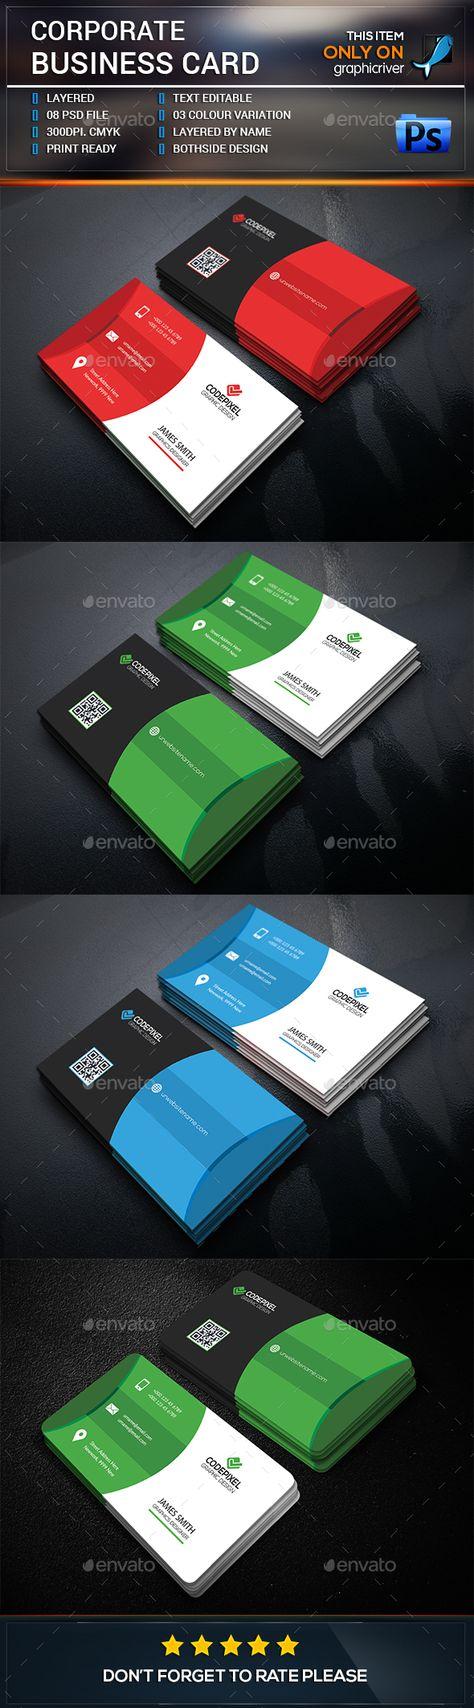 featureseasy customizable and editable business card 375